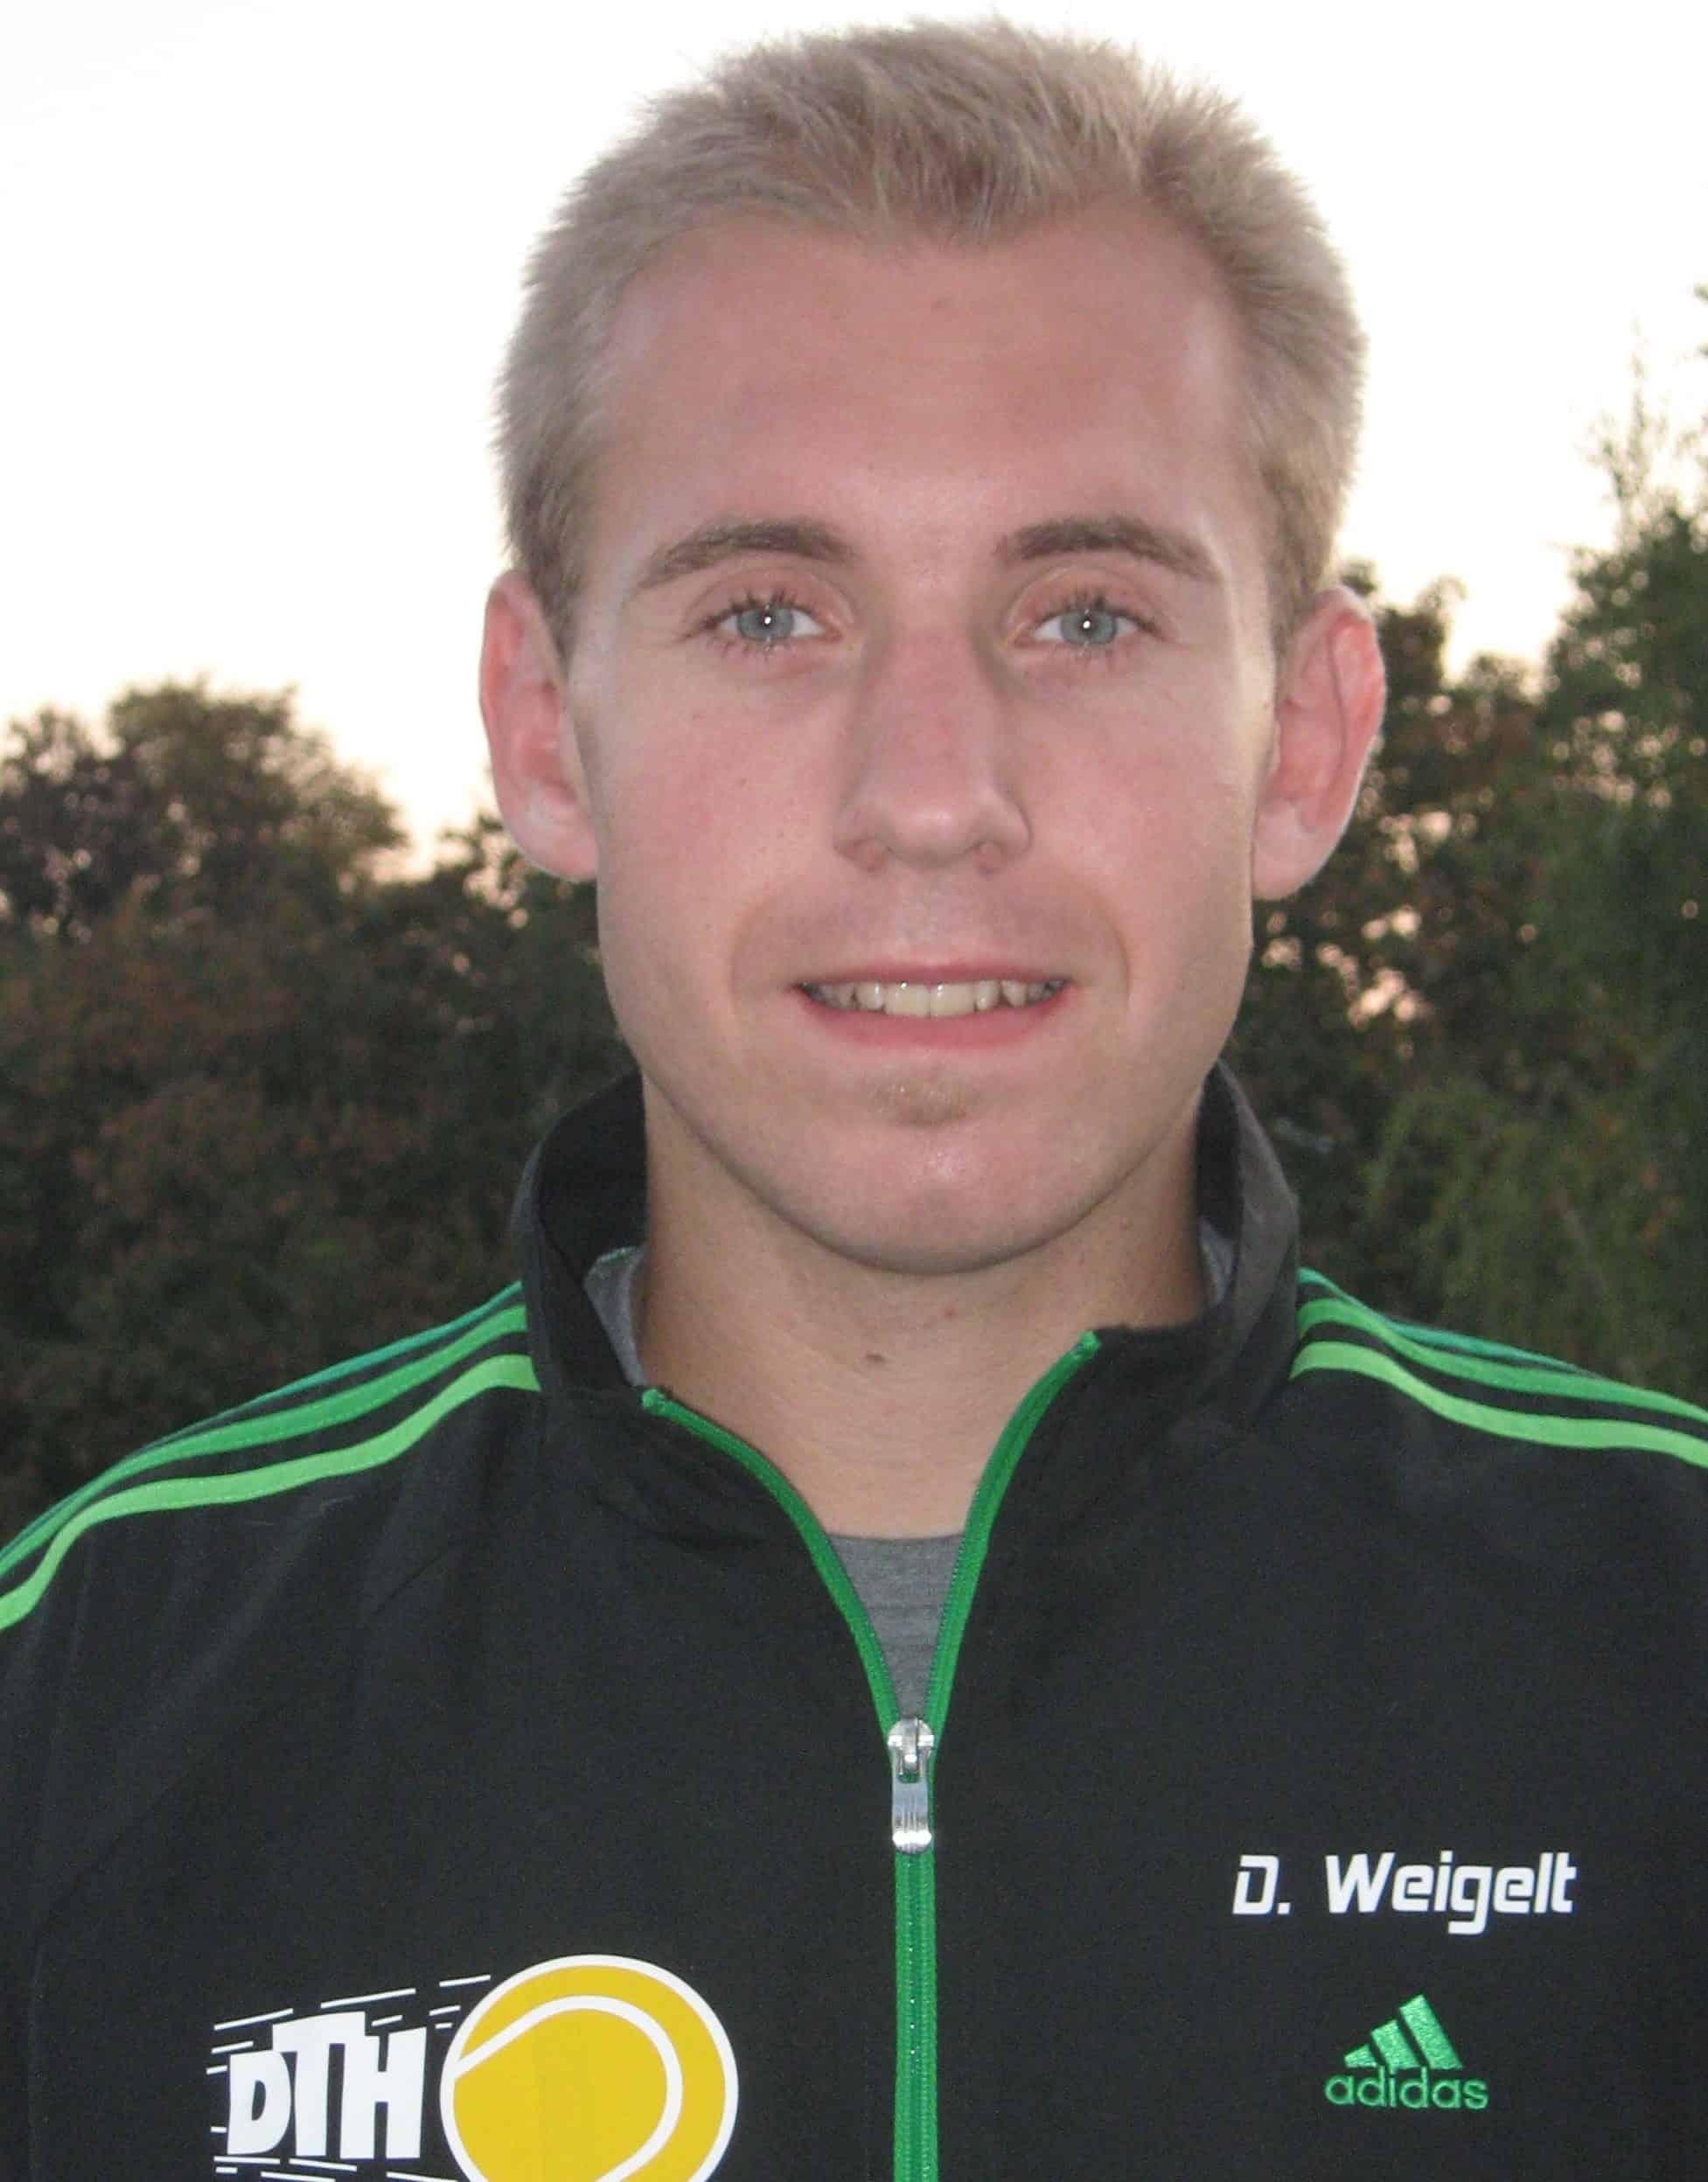 Daniel Weigelt